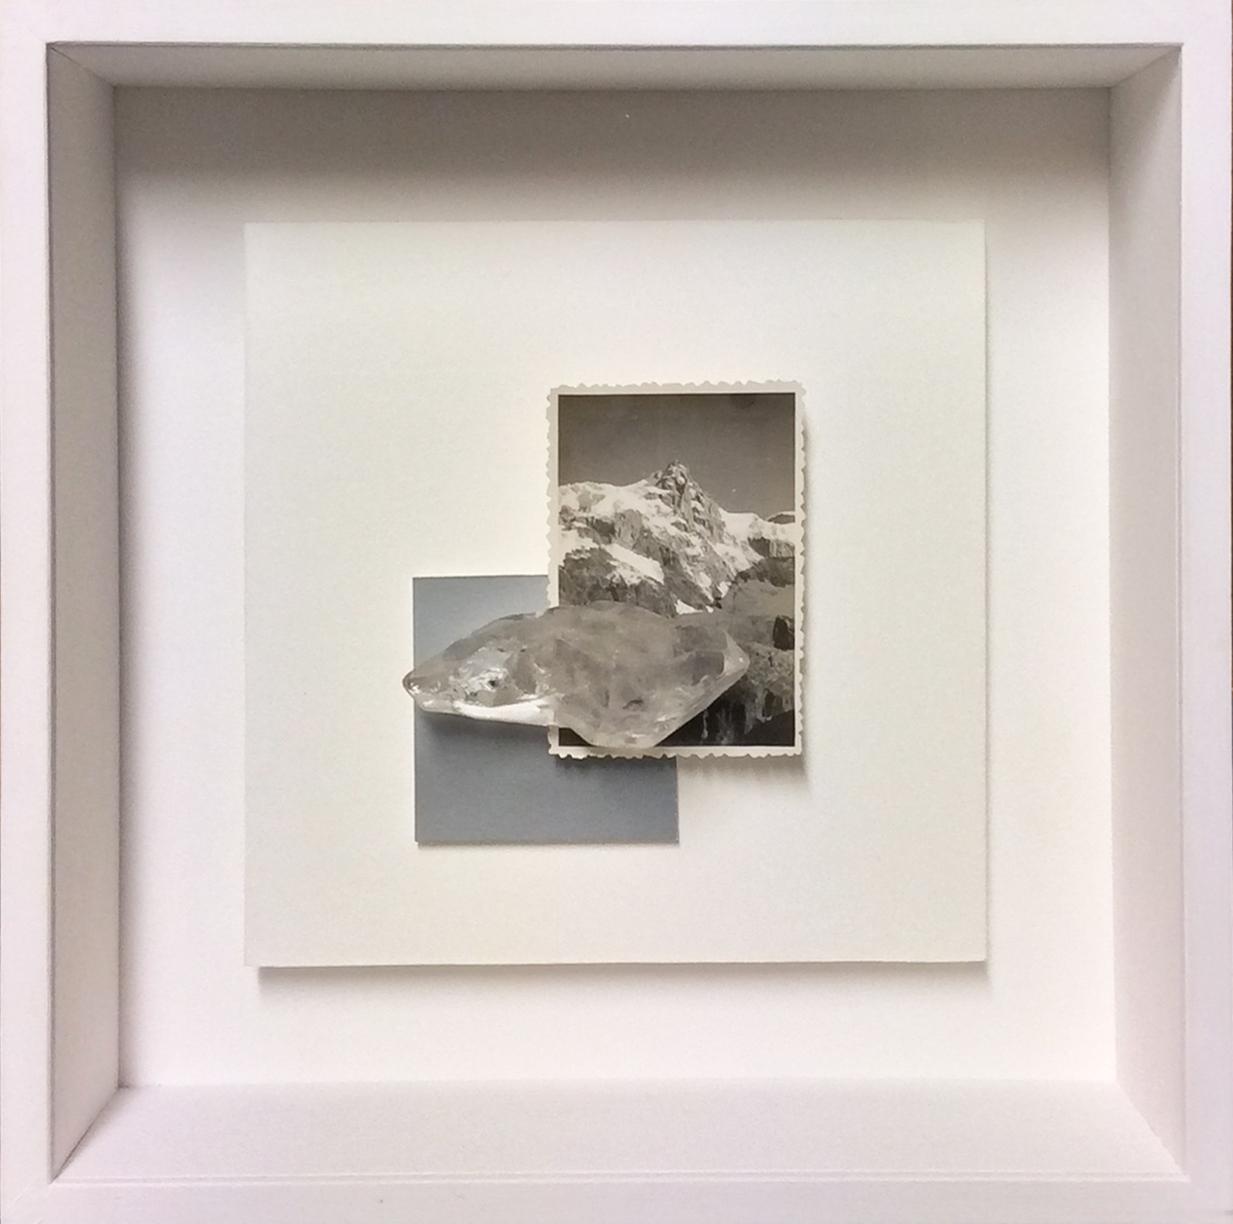 19. Galleria-l'Affiche_Alfred-Drago-Rens_Montagna-pura#3_2016_25x25cm.jpg